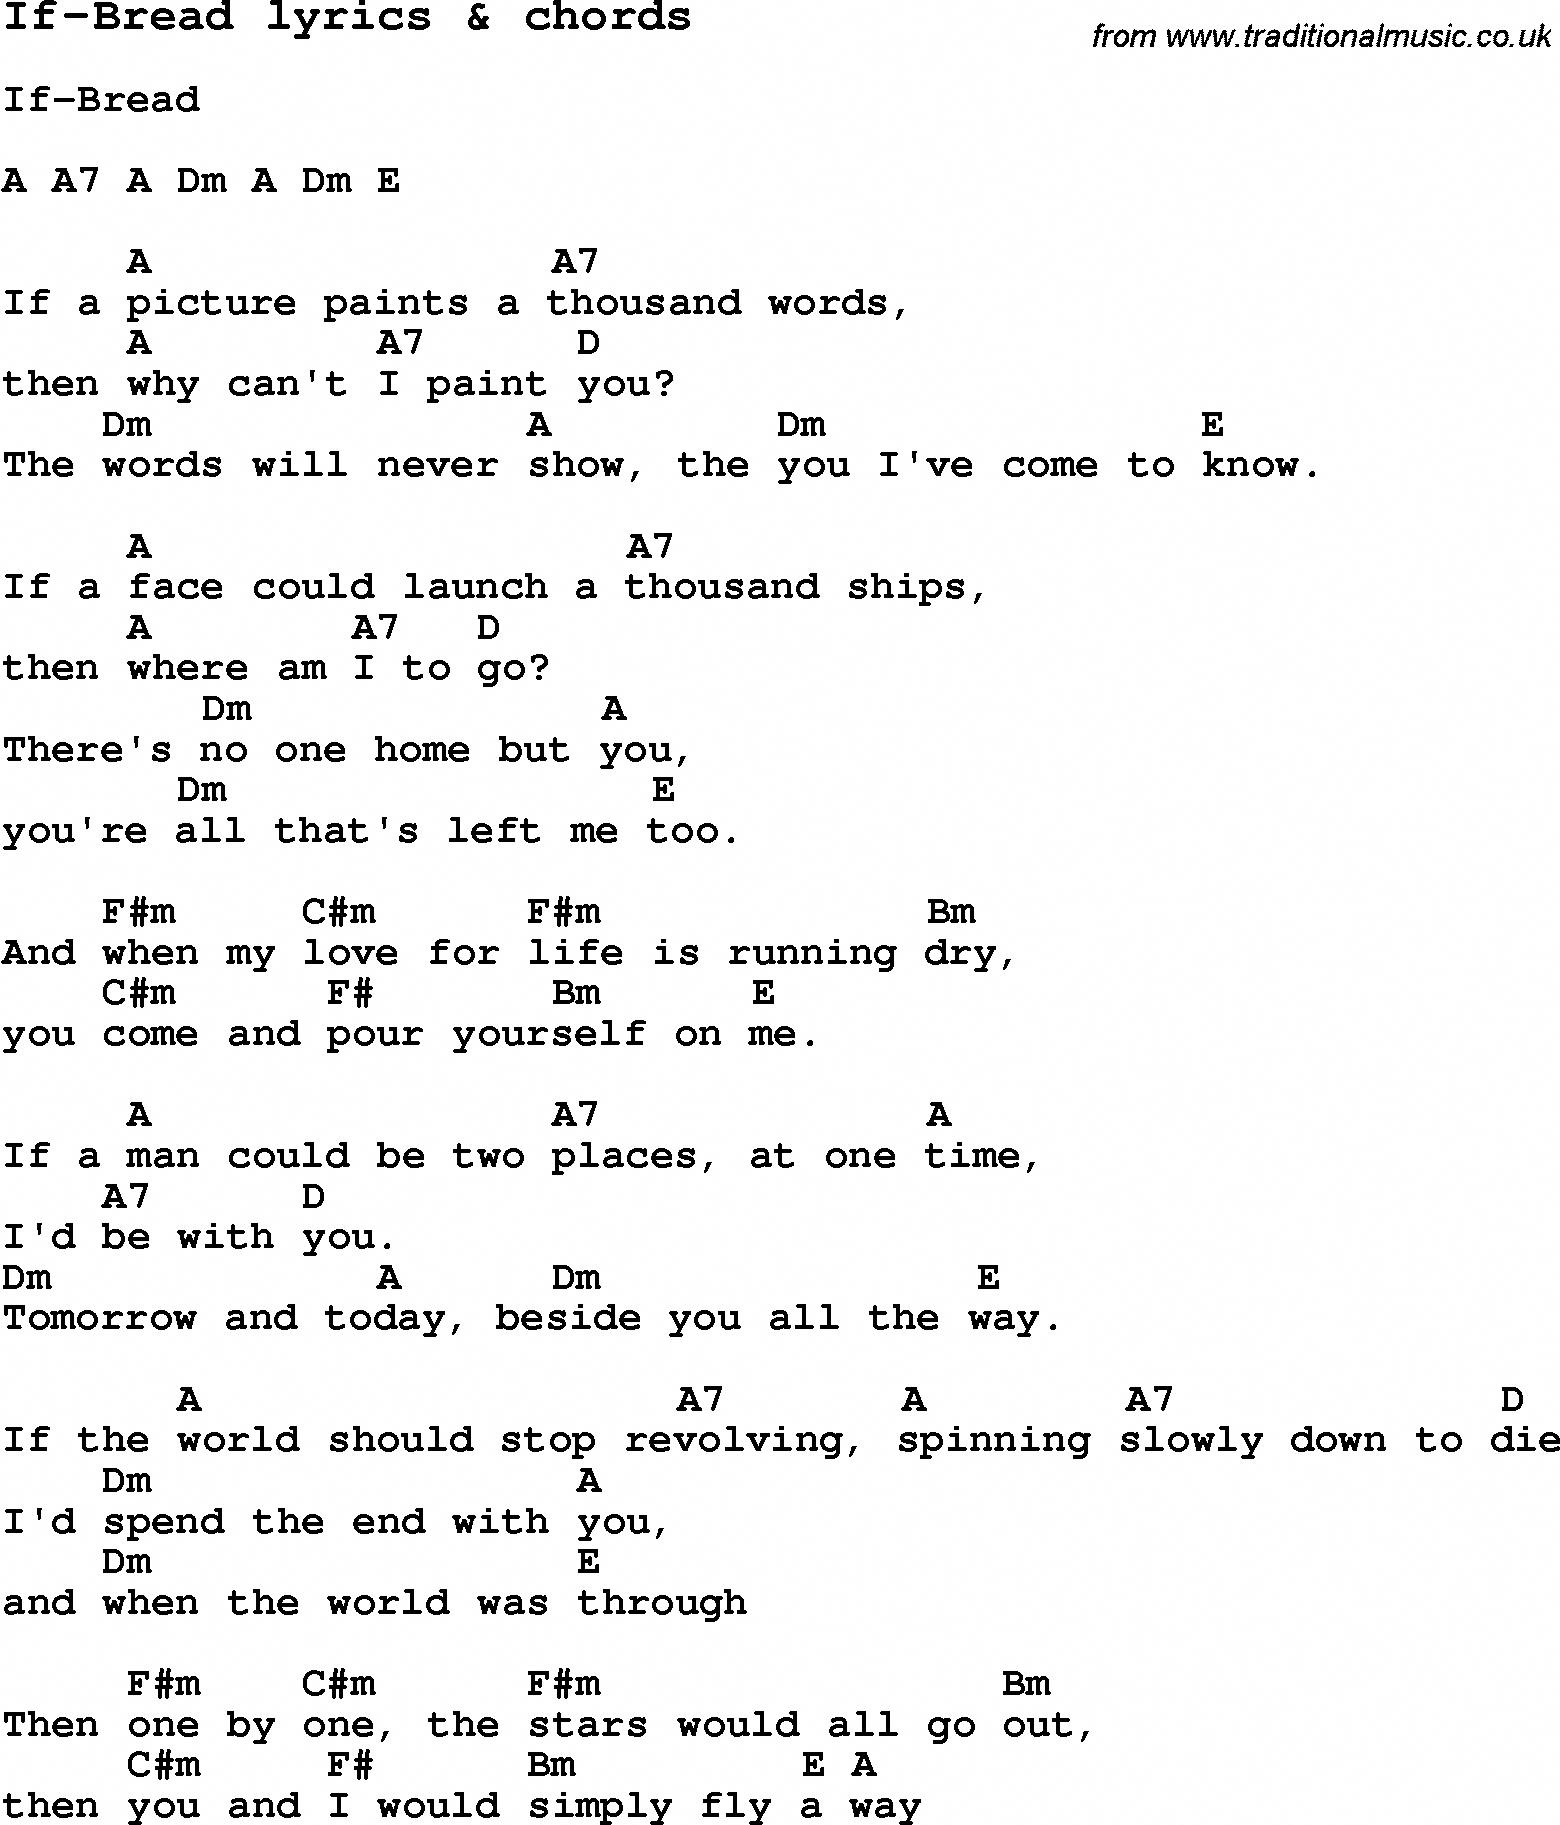 Love Song Lyrics For If Bread With Chords For Ukulele Guitar Banjo Etc Ukuleleforbeginners Guitar Lessons Songs Ukulele Chords Songs Song Lyrics And Chords